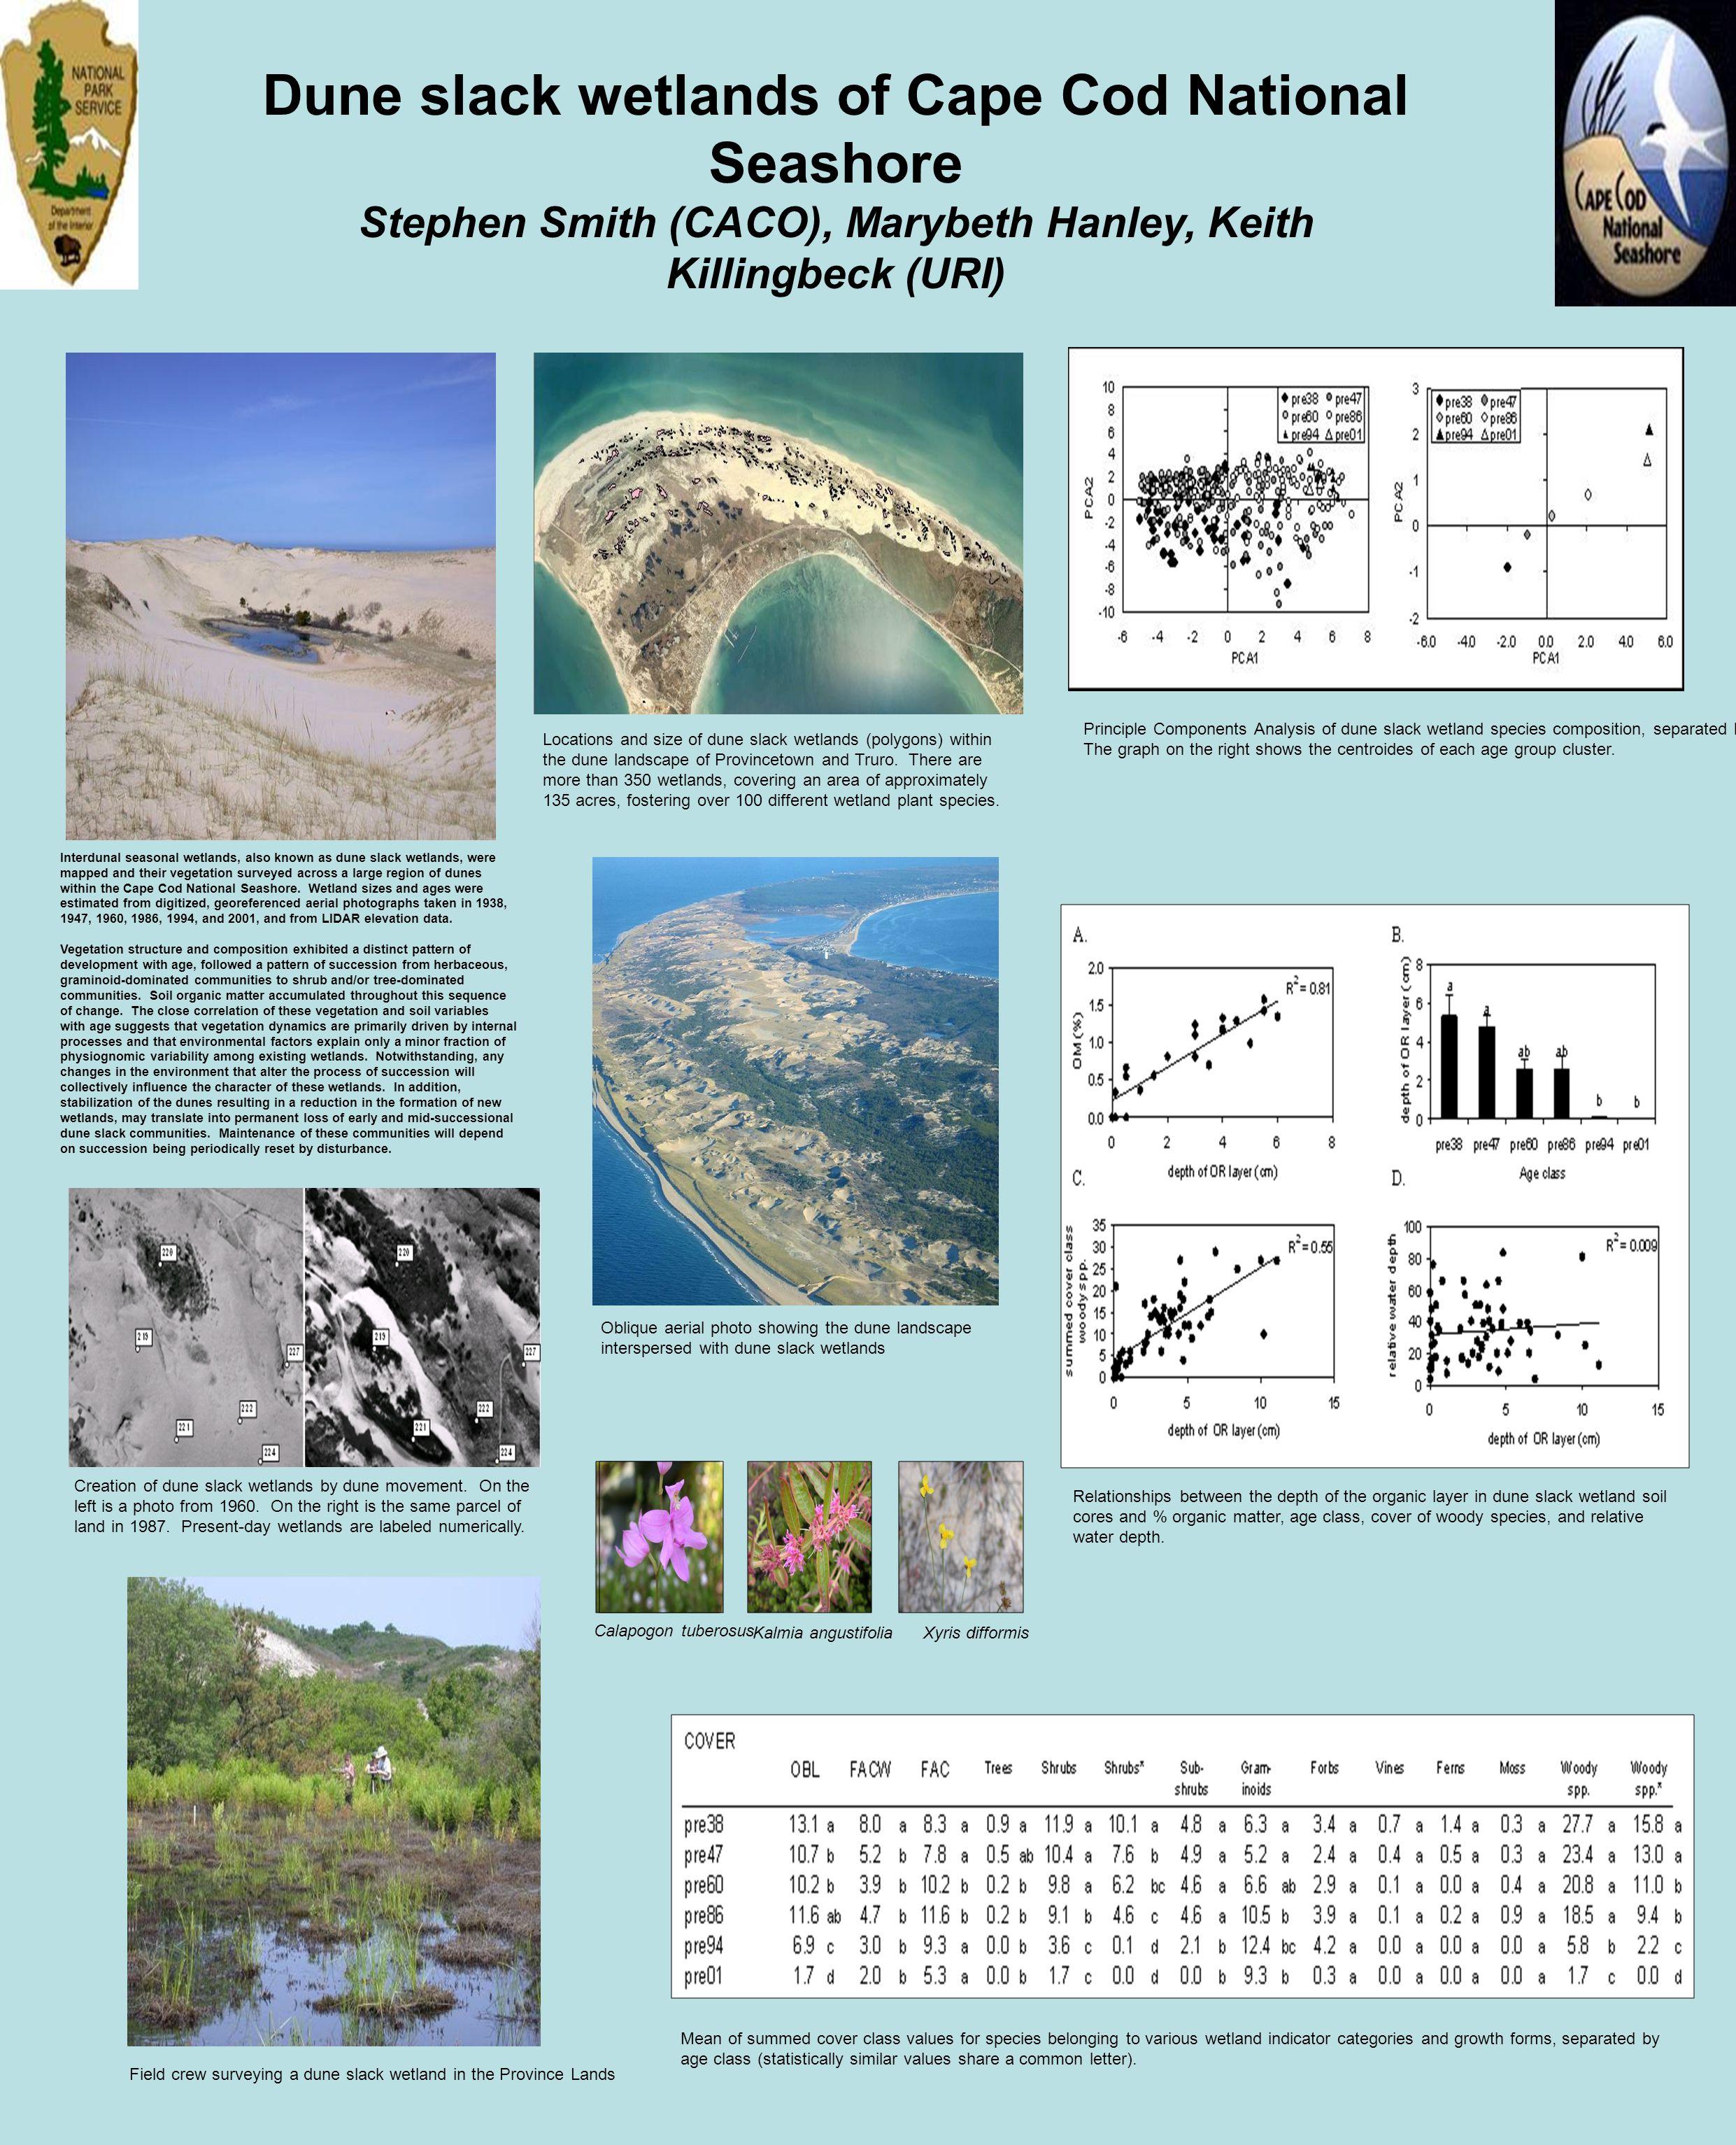 Dune slack wetlands of Cape Cod National Seashore Stephen Smith (CACO), Marybeth Hanley, Keith Killingbeck (URI) Interdunal seasonal wetlands, also kn